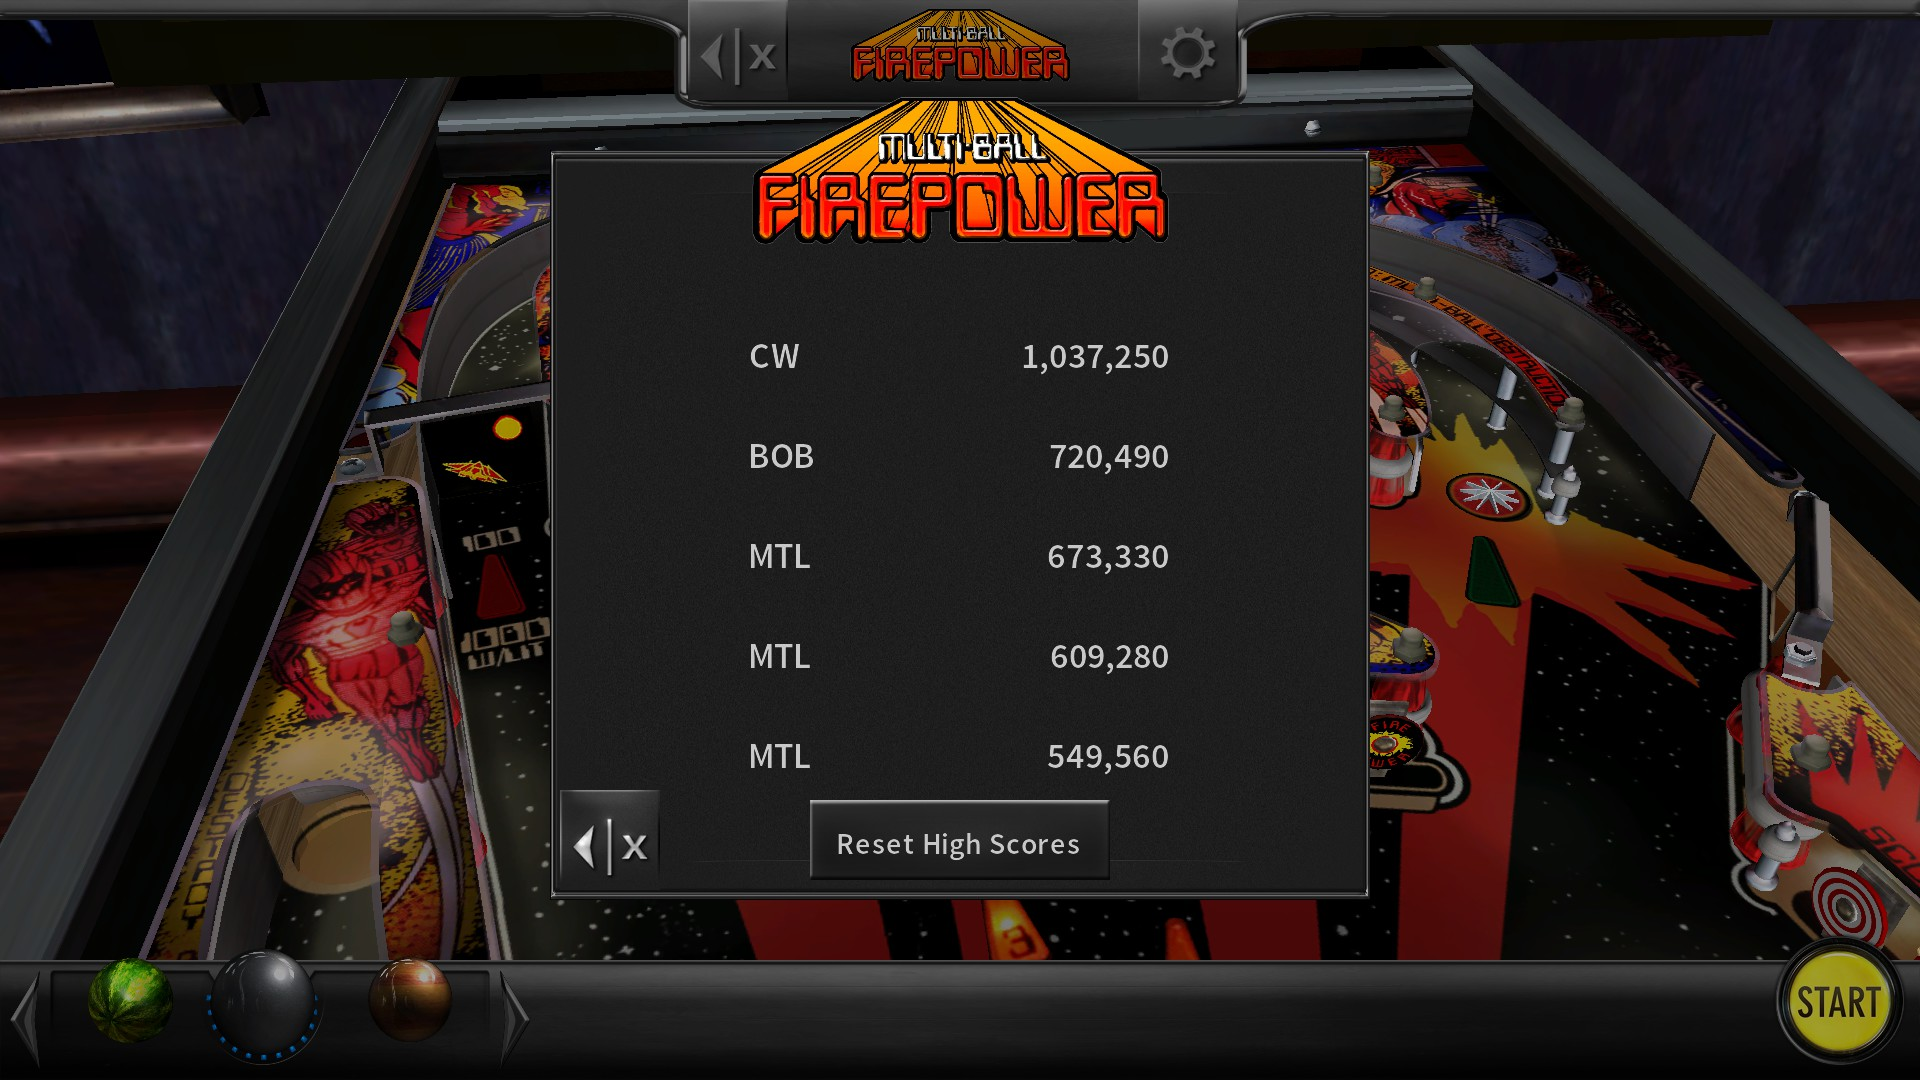 Mantalow: Pinball Arcade: Firepower (PC) 673,330 points on 2018-02-14 11:17:05